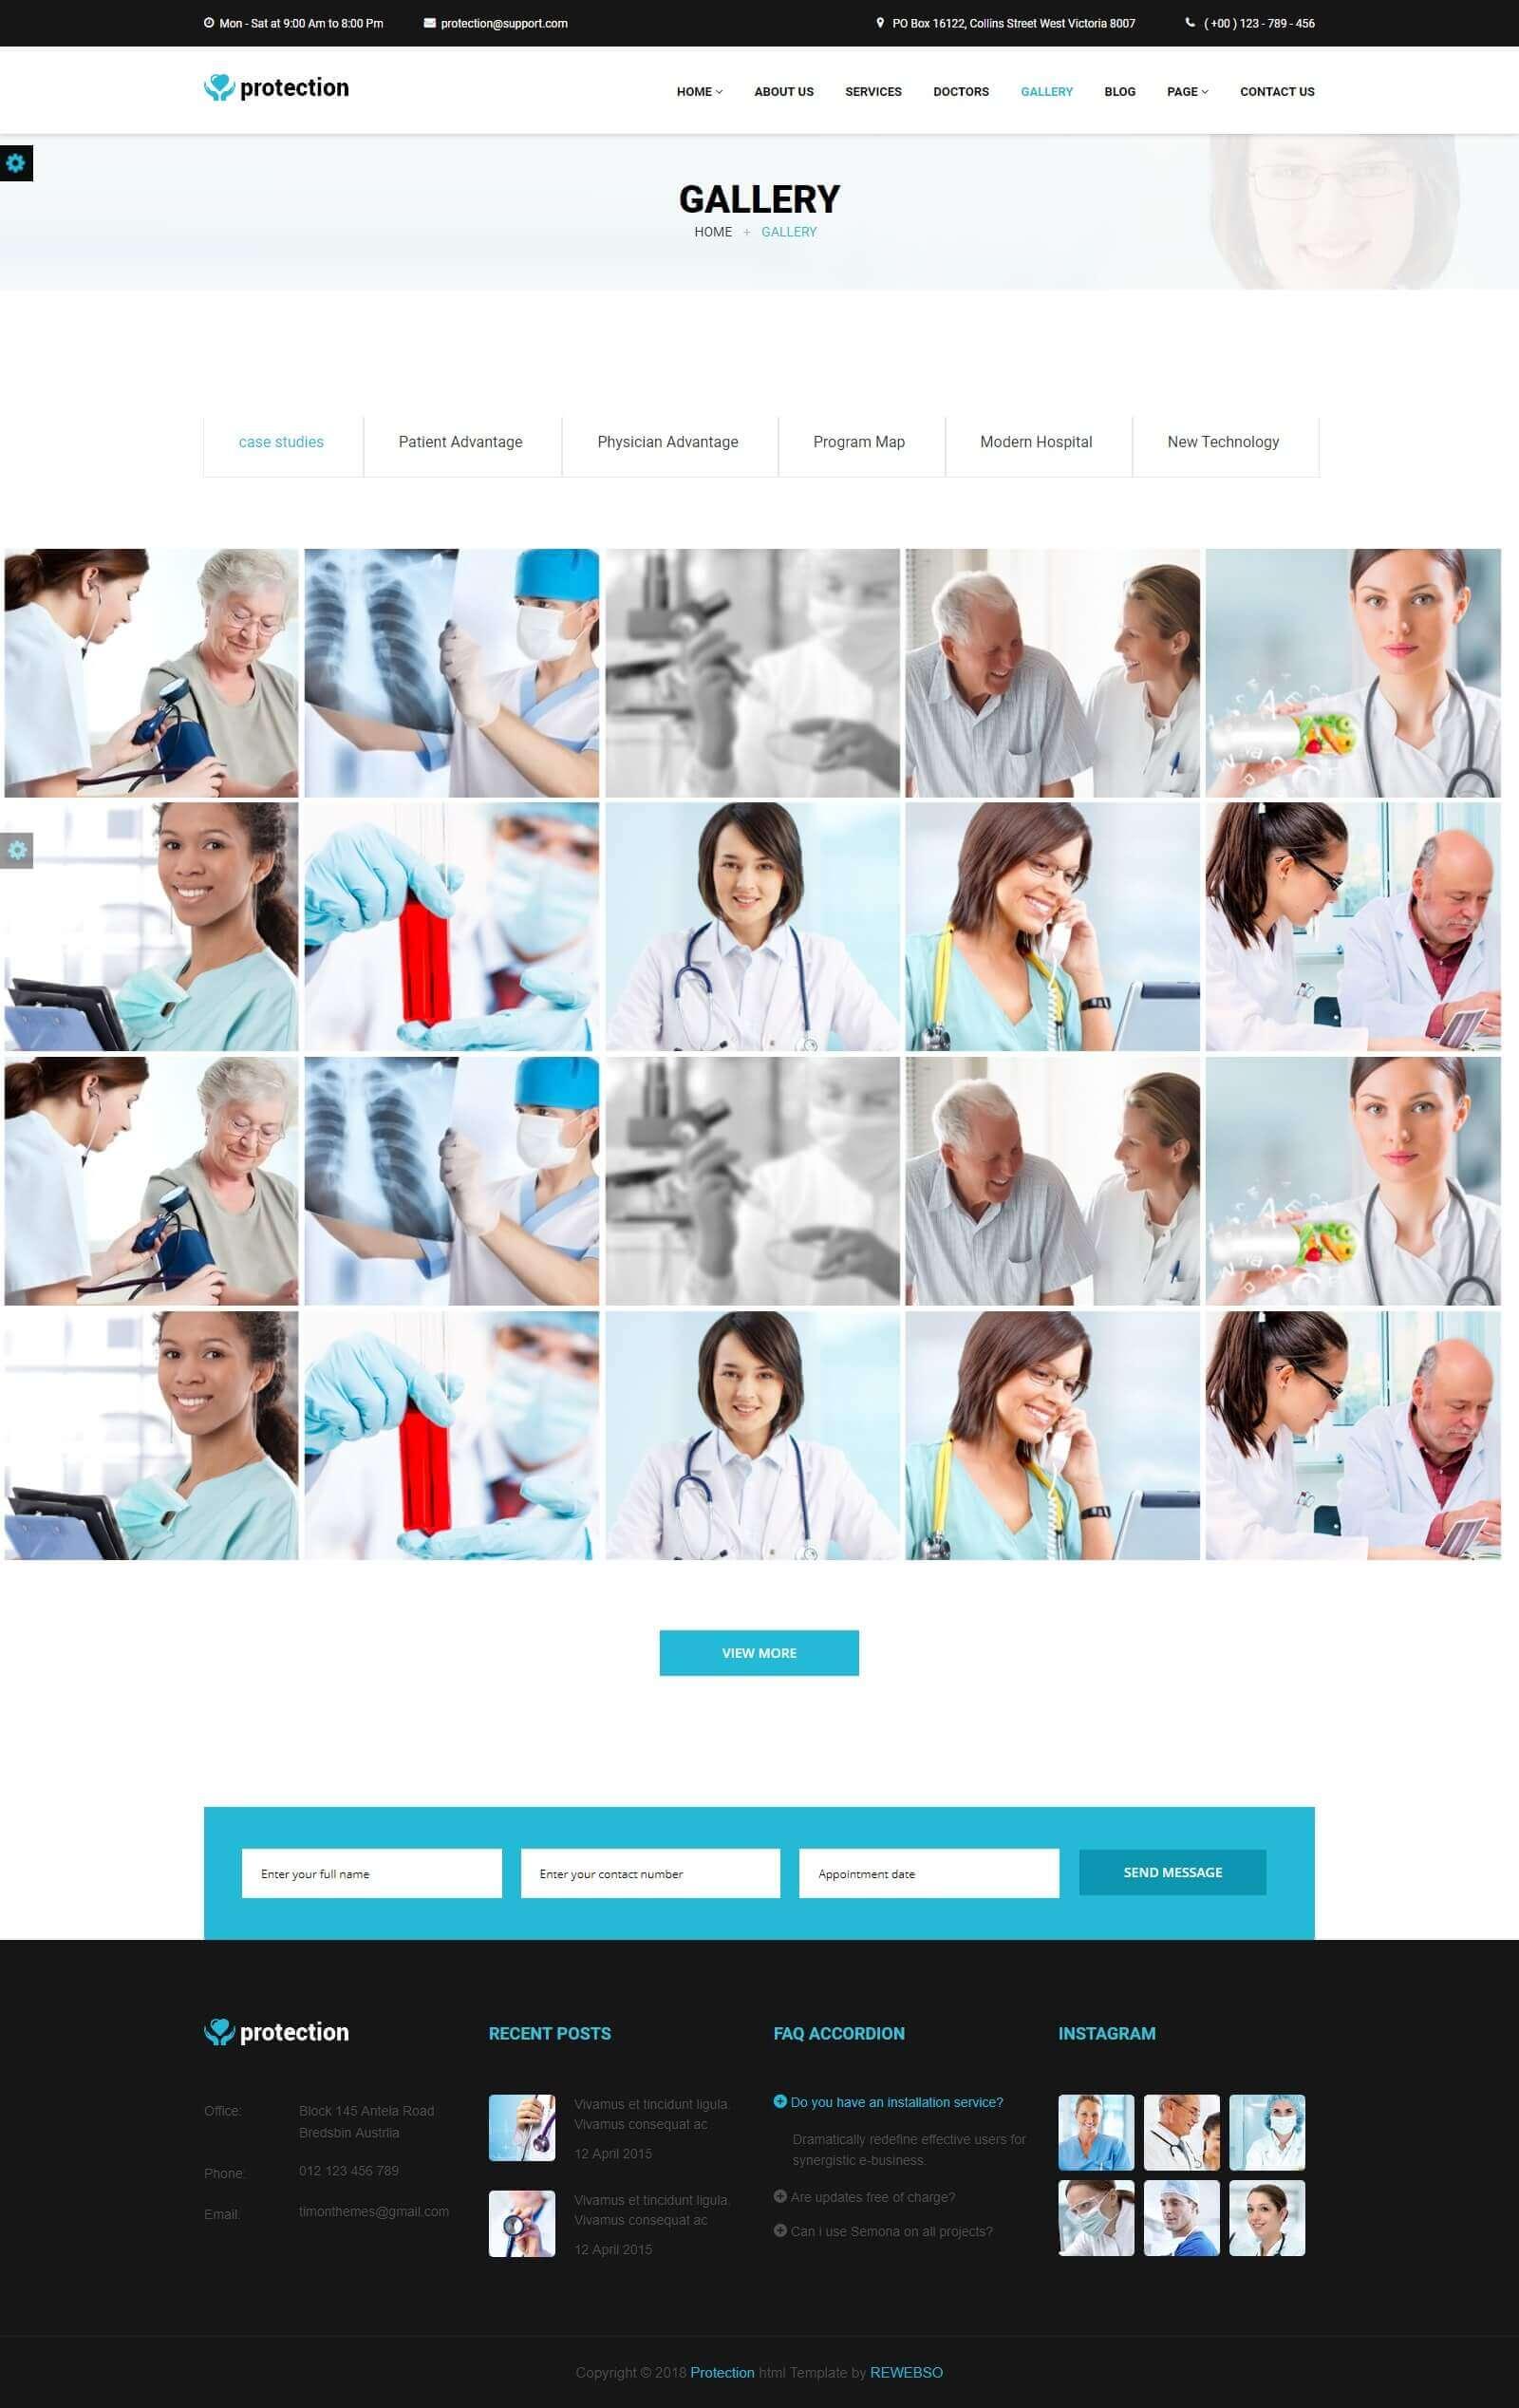 Module giới thiệu bệnh viện